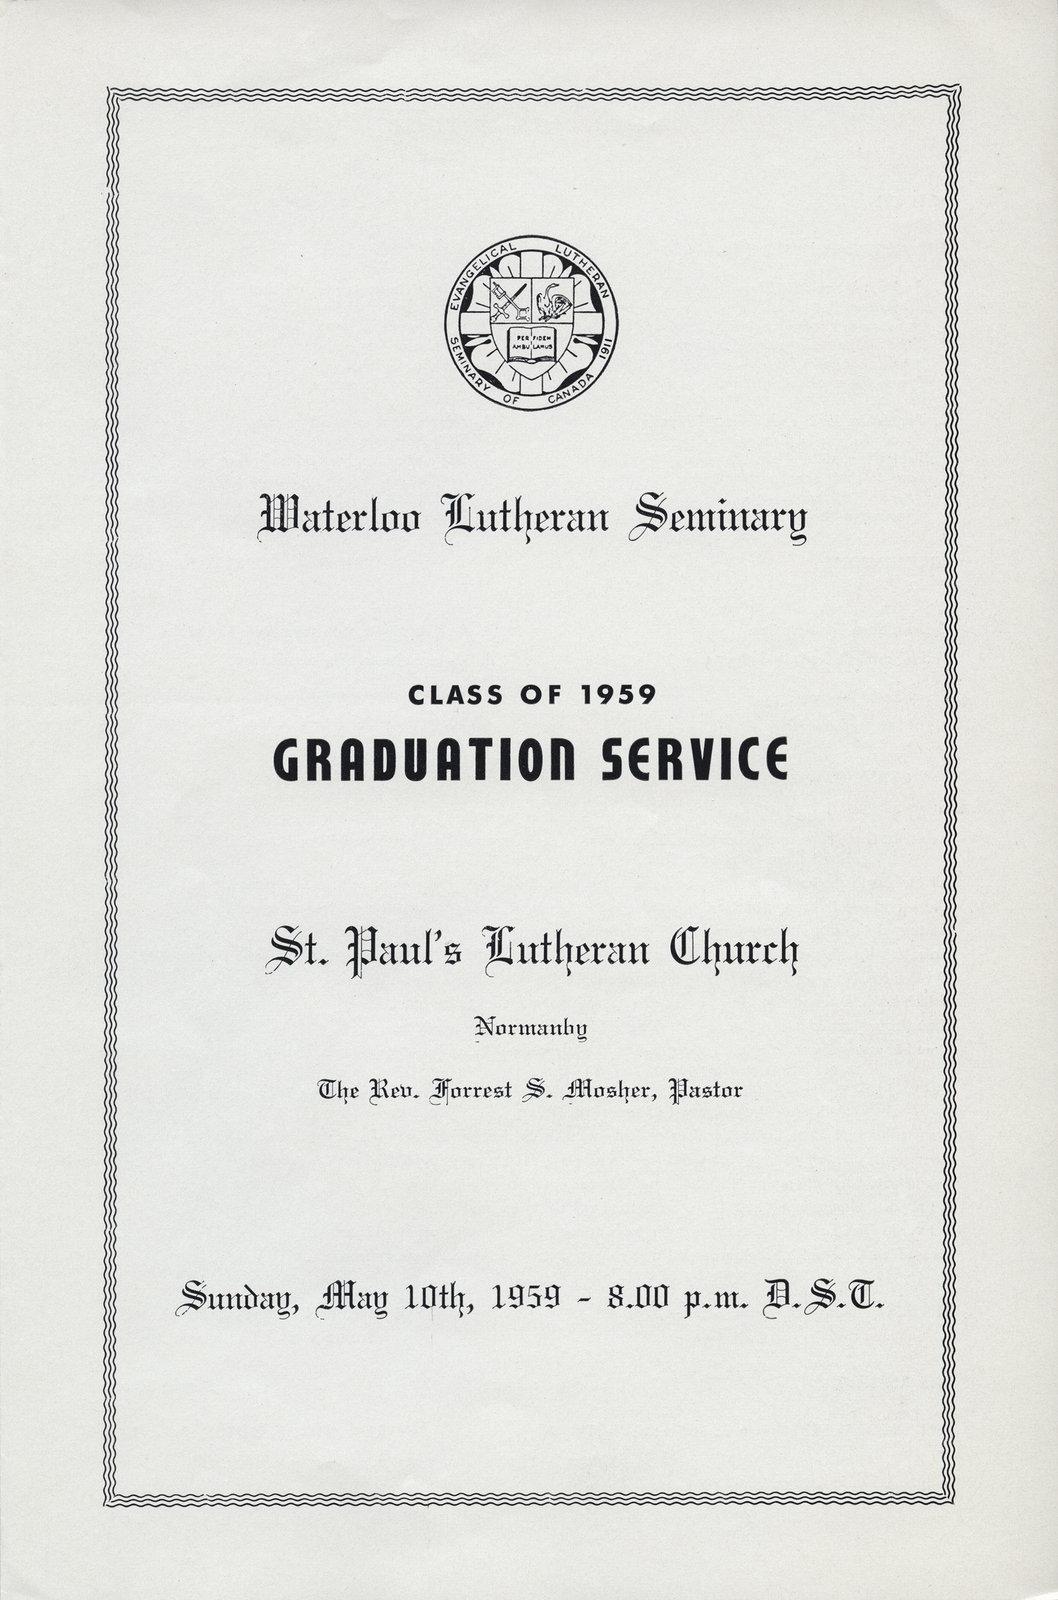 Waterloo Lutheran Seminary Class of 1959 Graduation Service program